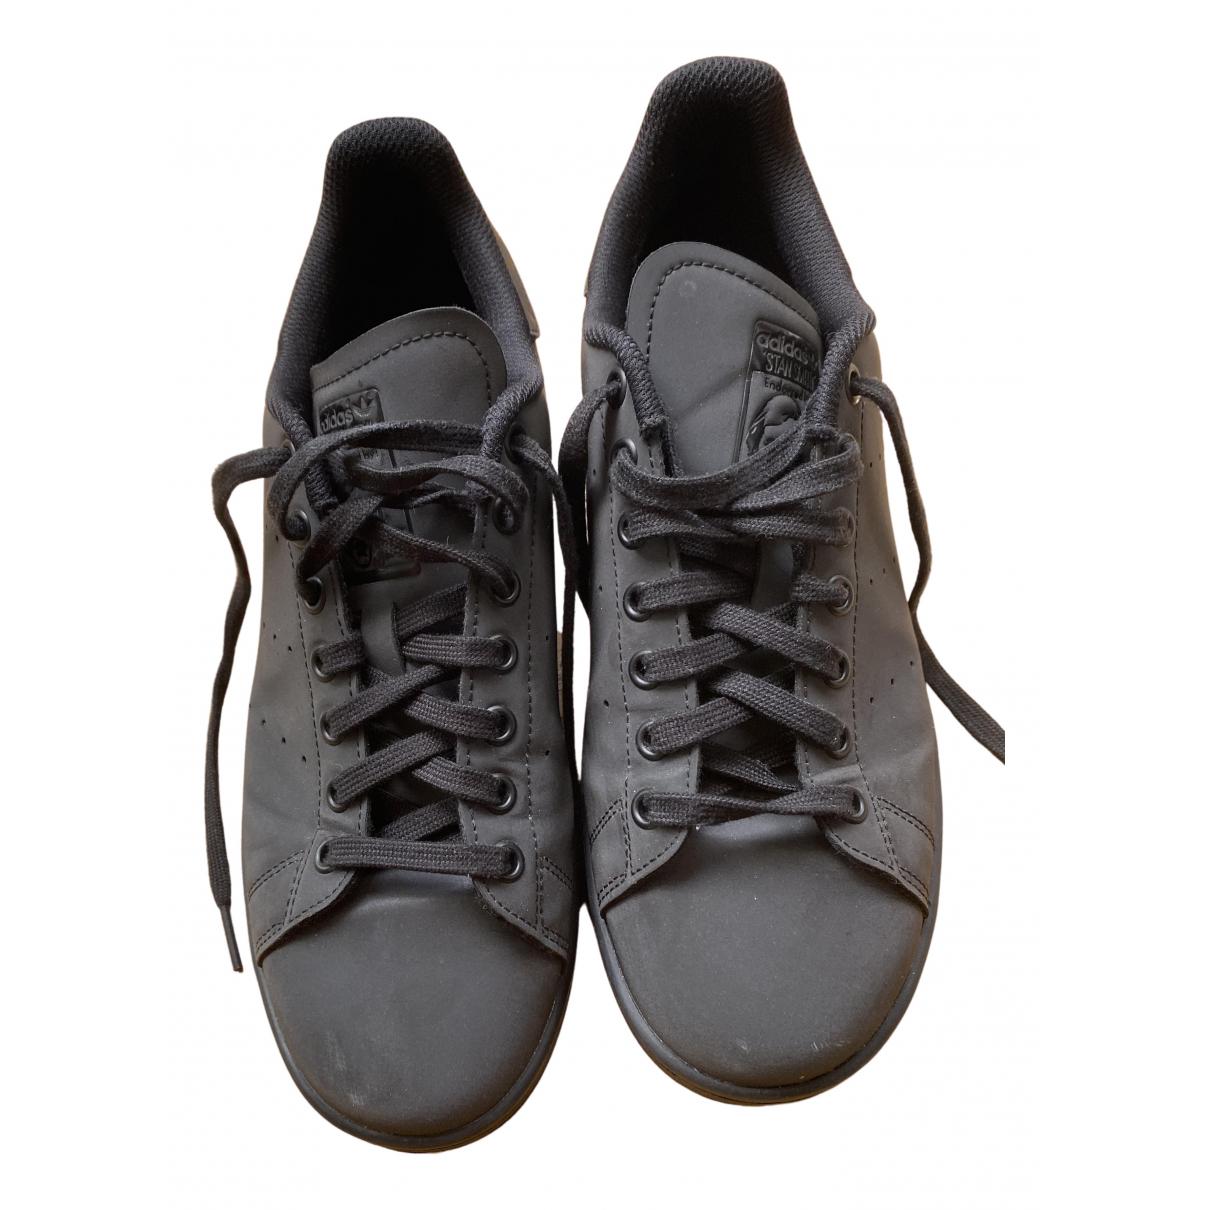 Adidas - Baskets Stan Smith pour homme - noir